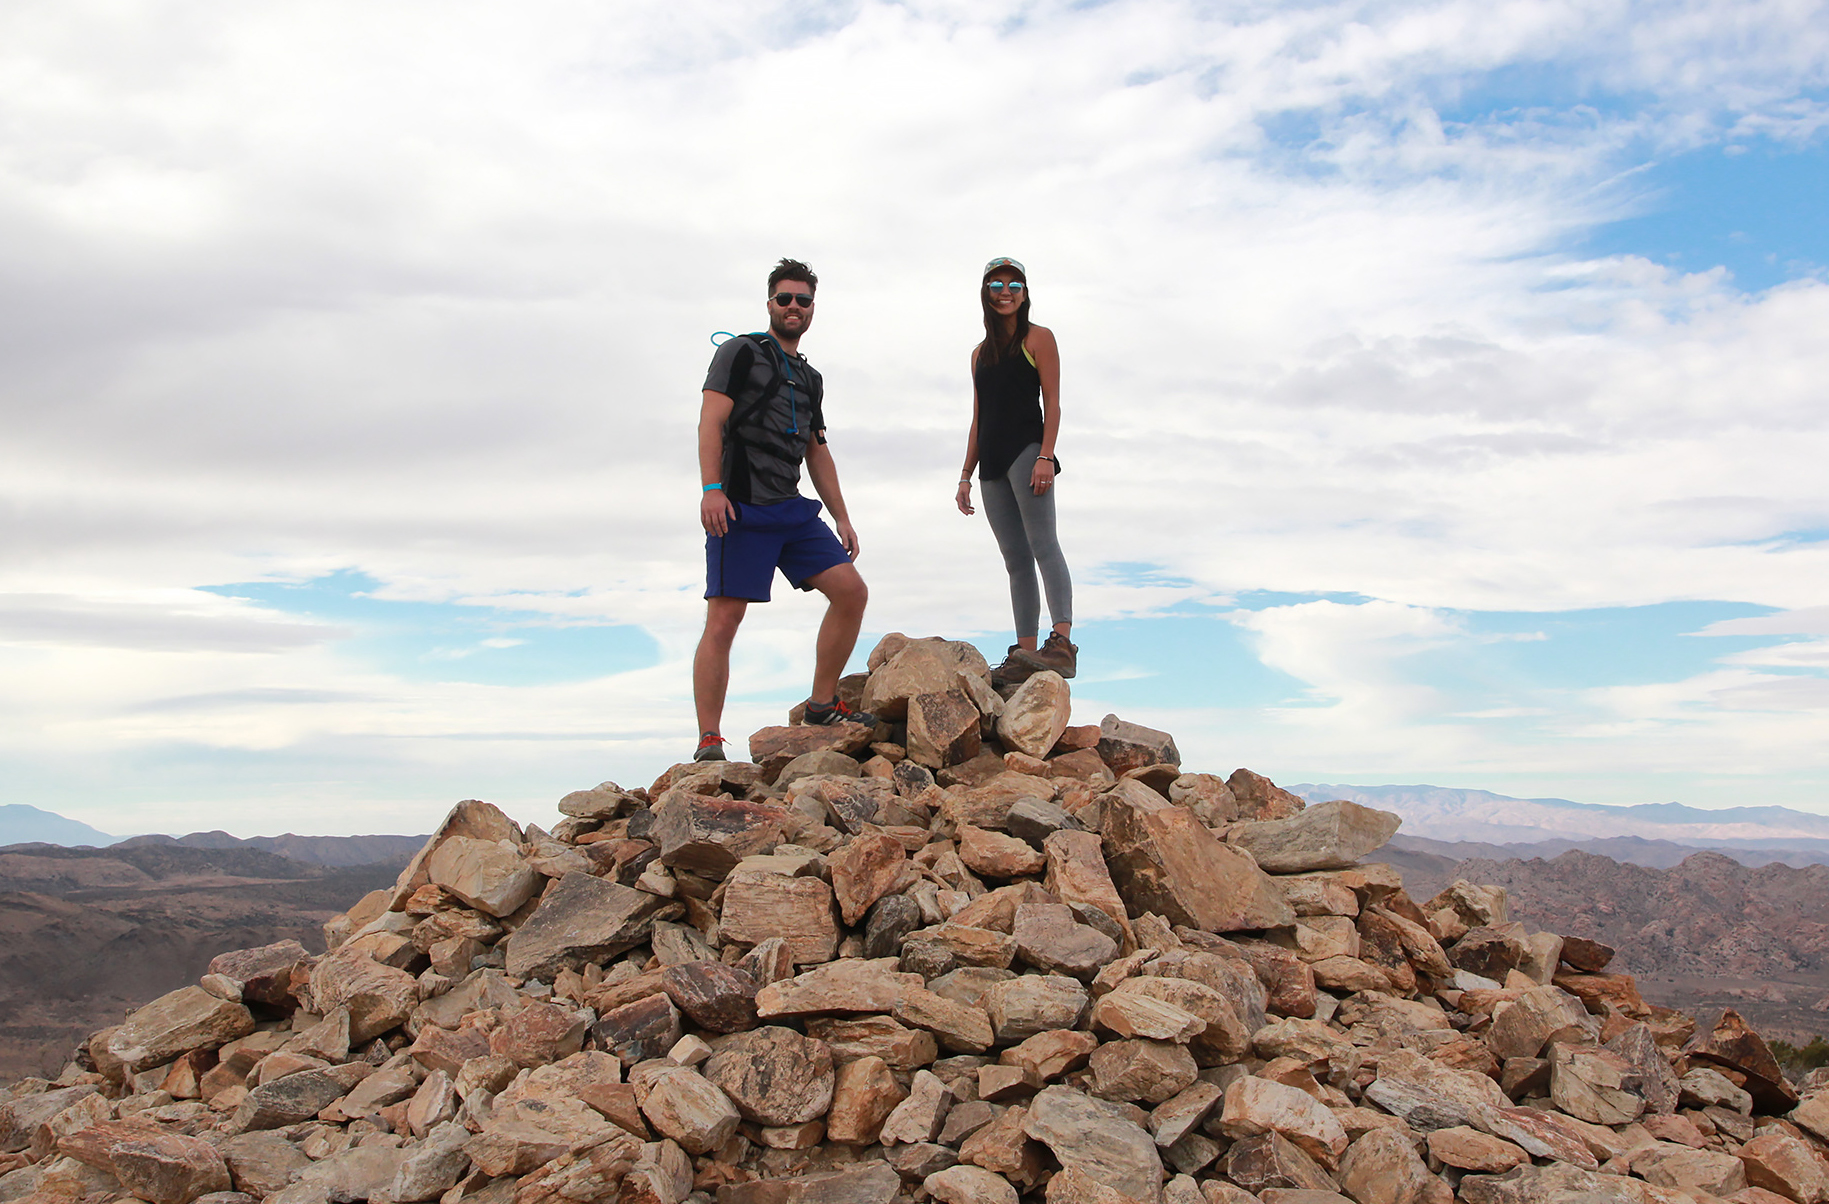 Mount Ryan Peak